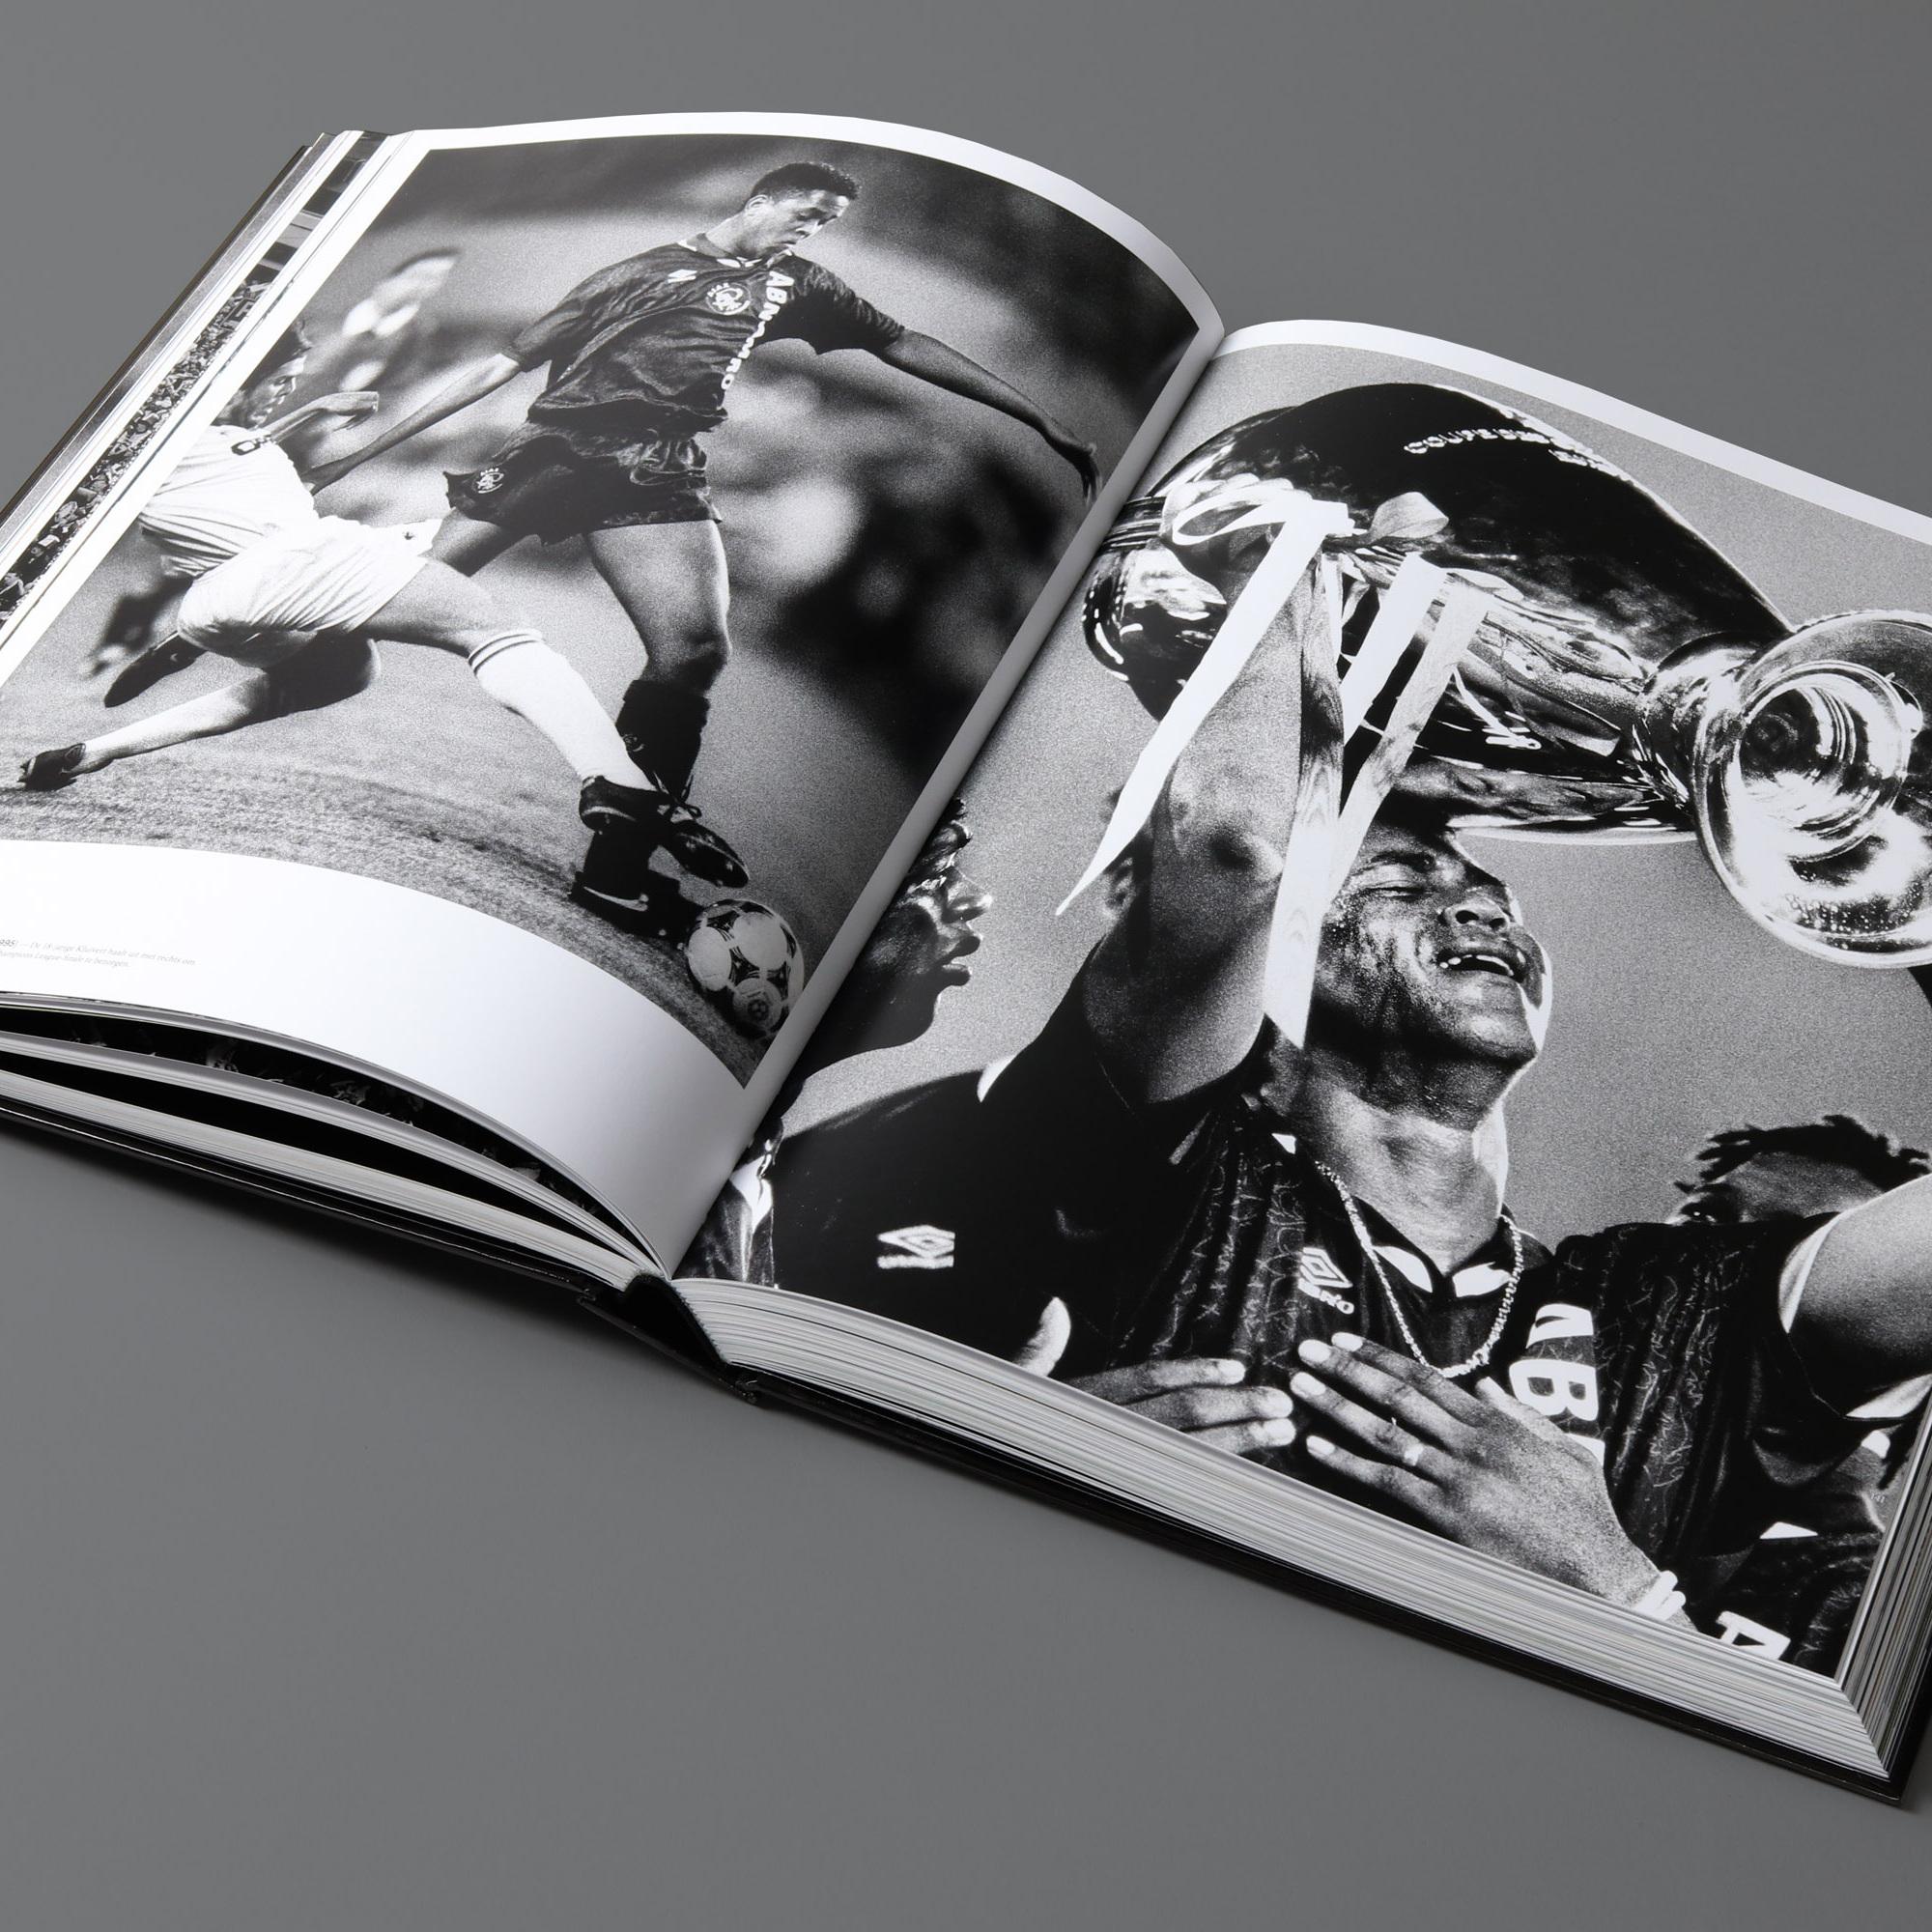 mendo-books-Sportret-studio-01-9-van-18-2000x2000-c-default.jpg